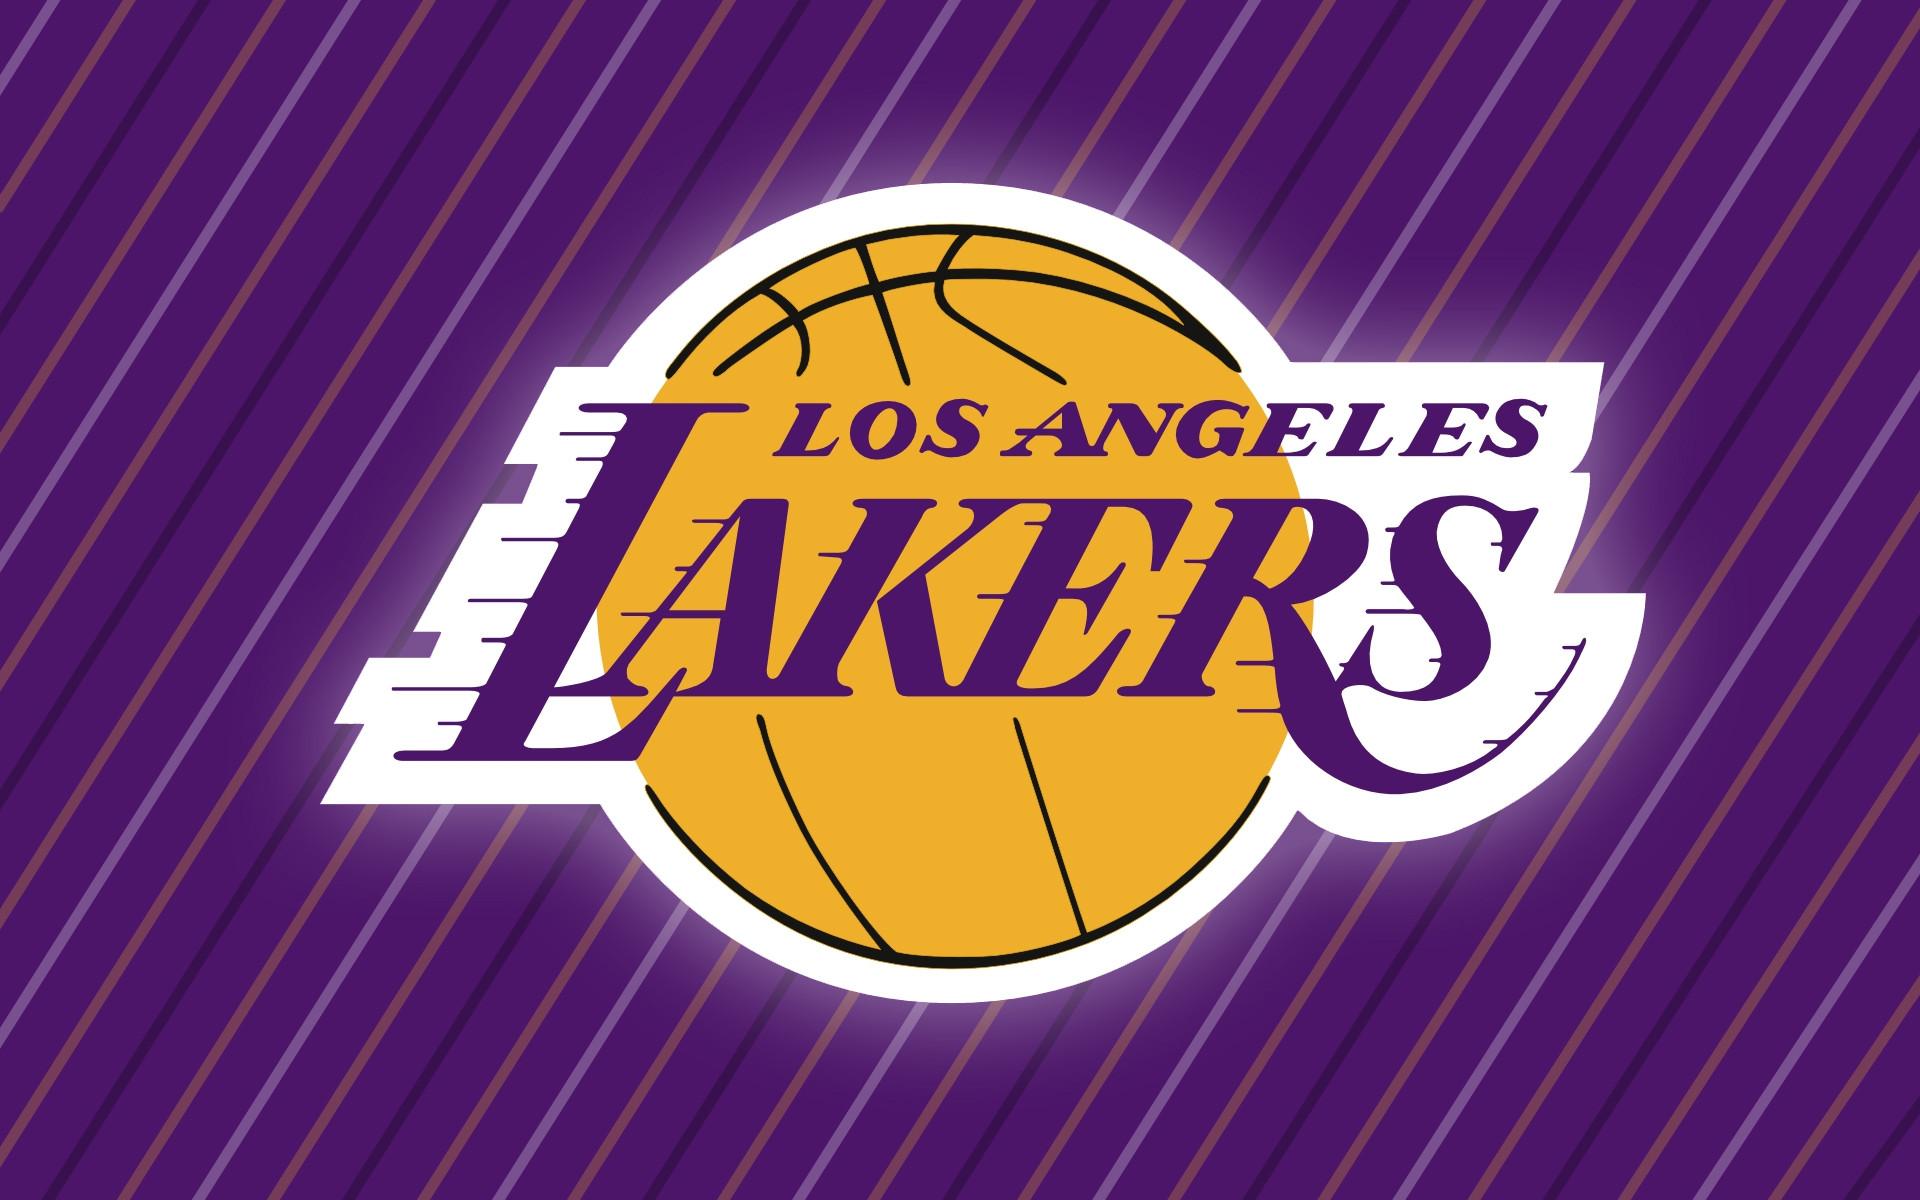 Res: 1920x1200, Lakers HD wallpaper logo .